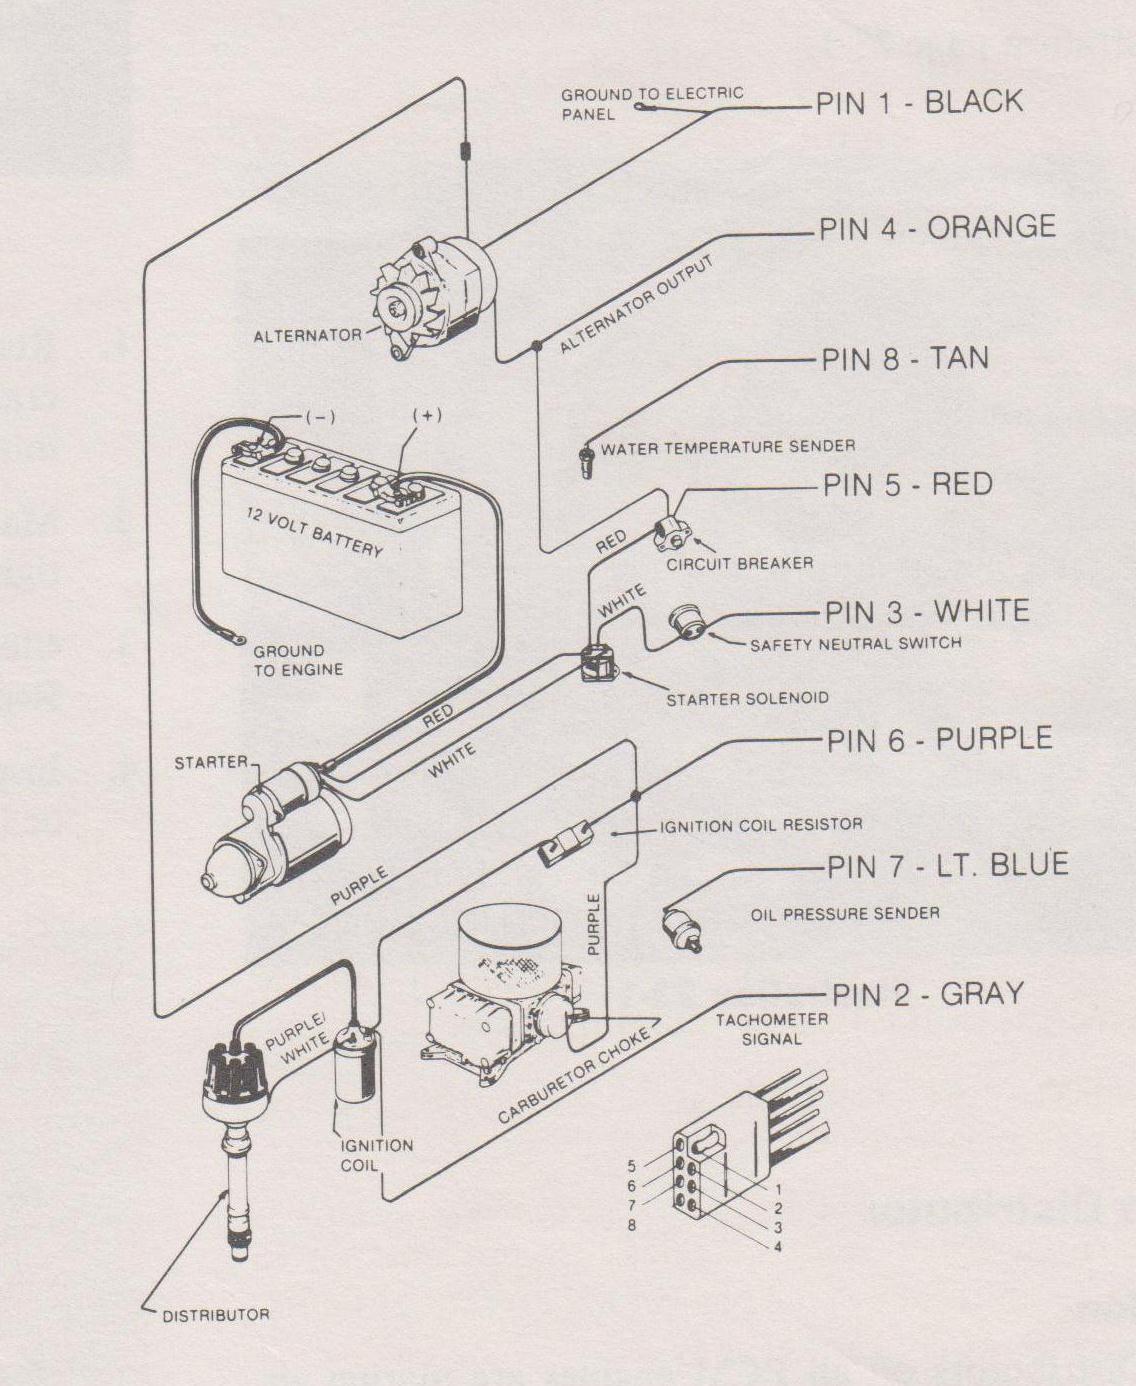 pride wiring harness diagram kia pride wiring diagram e1 wiring diagram  kia pride wiring diagram e1 wiring